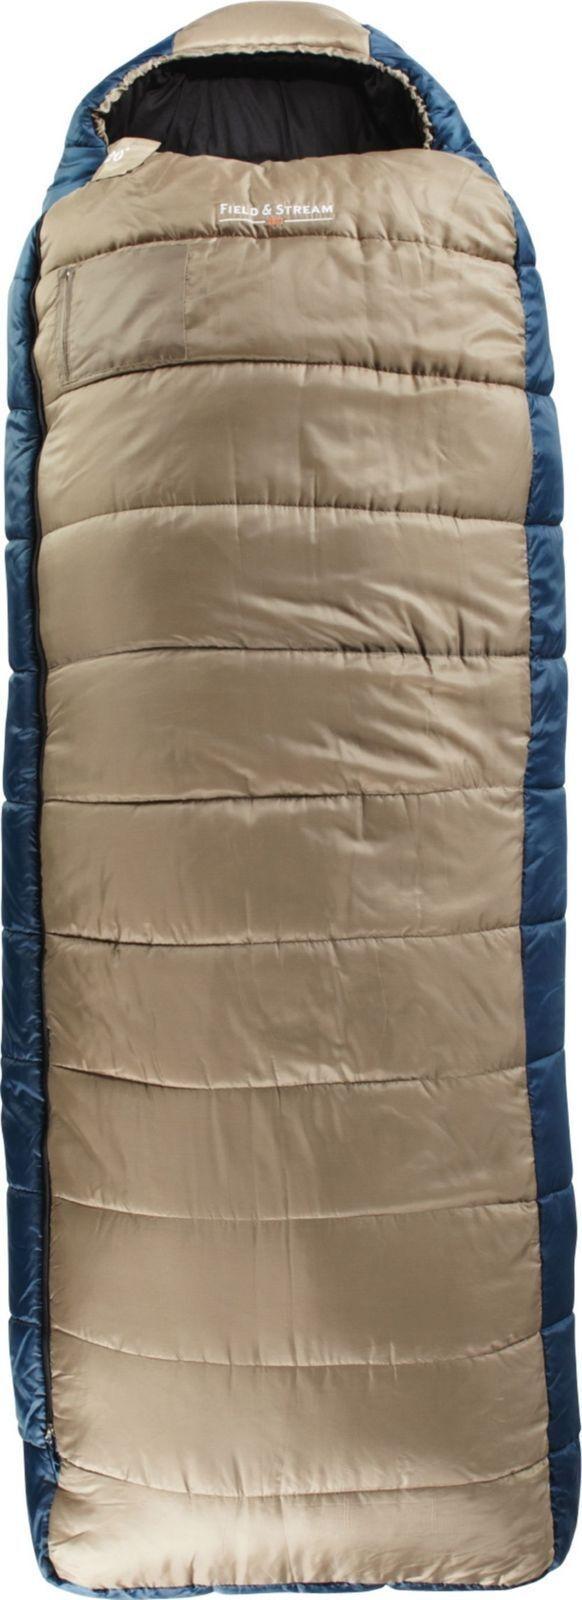 Field and Stream 20 Degree Pathfinder SemiMummy Sleeping Bag  Free Shipping